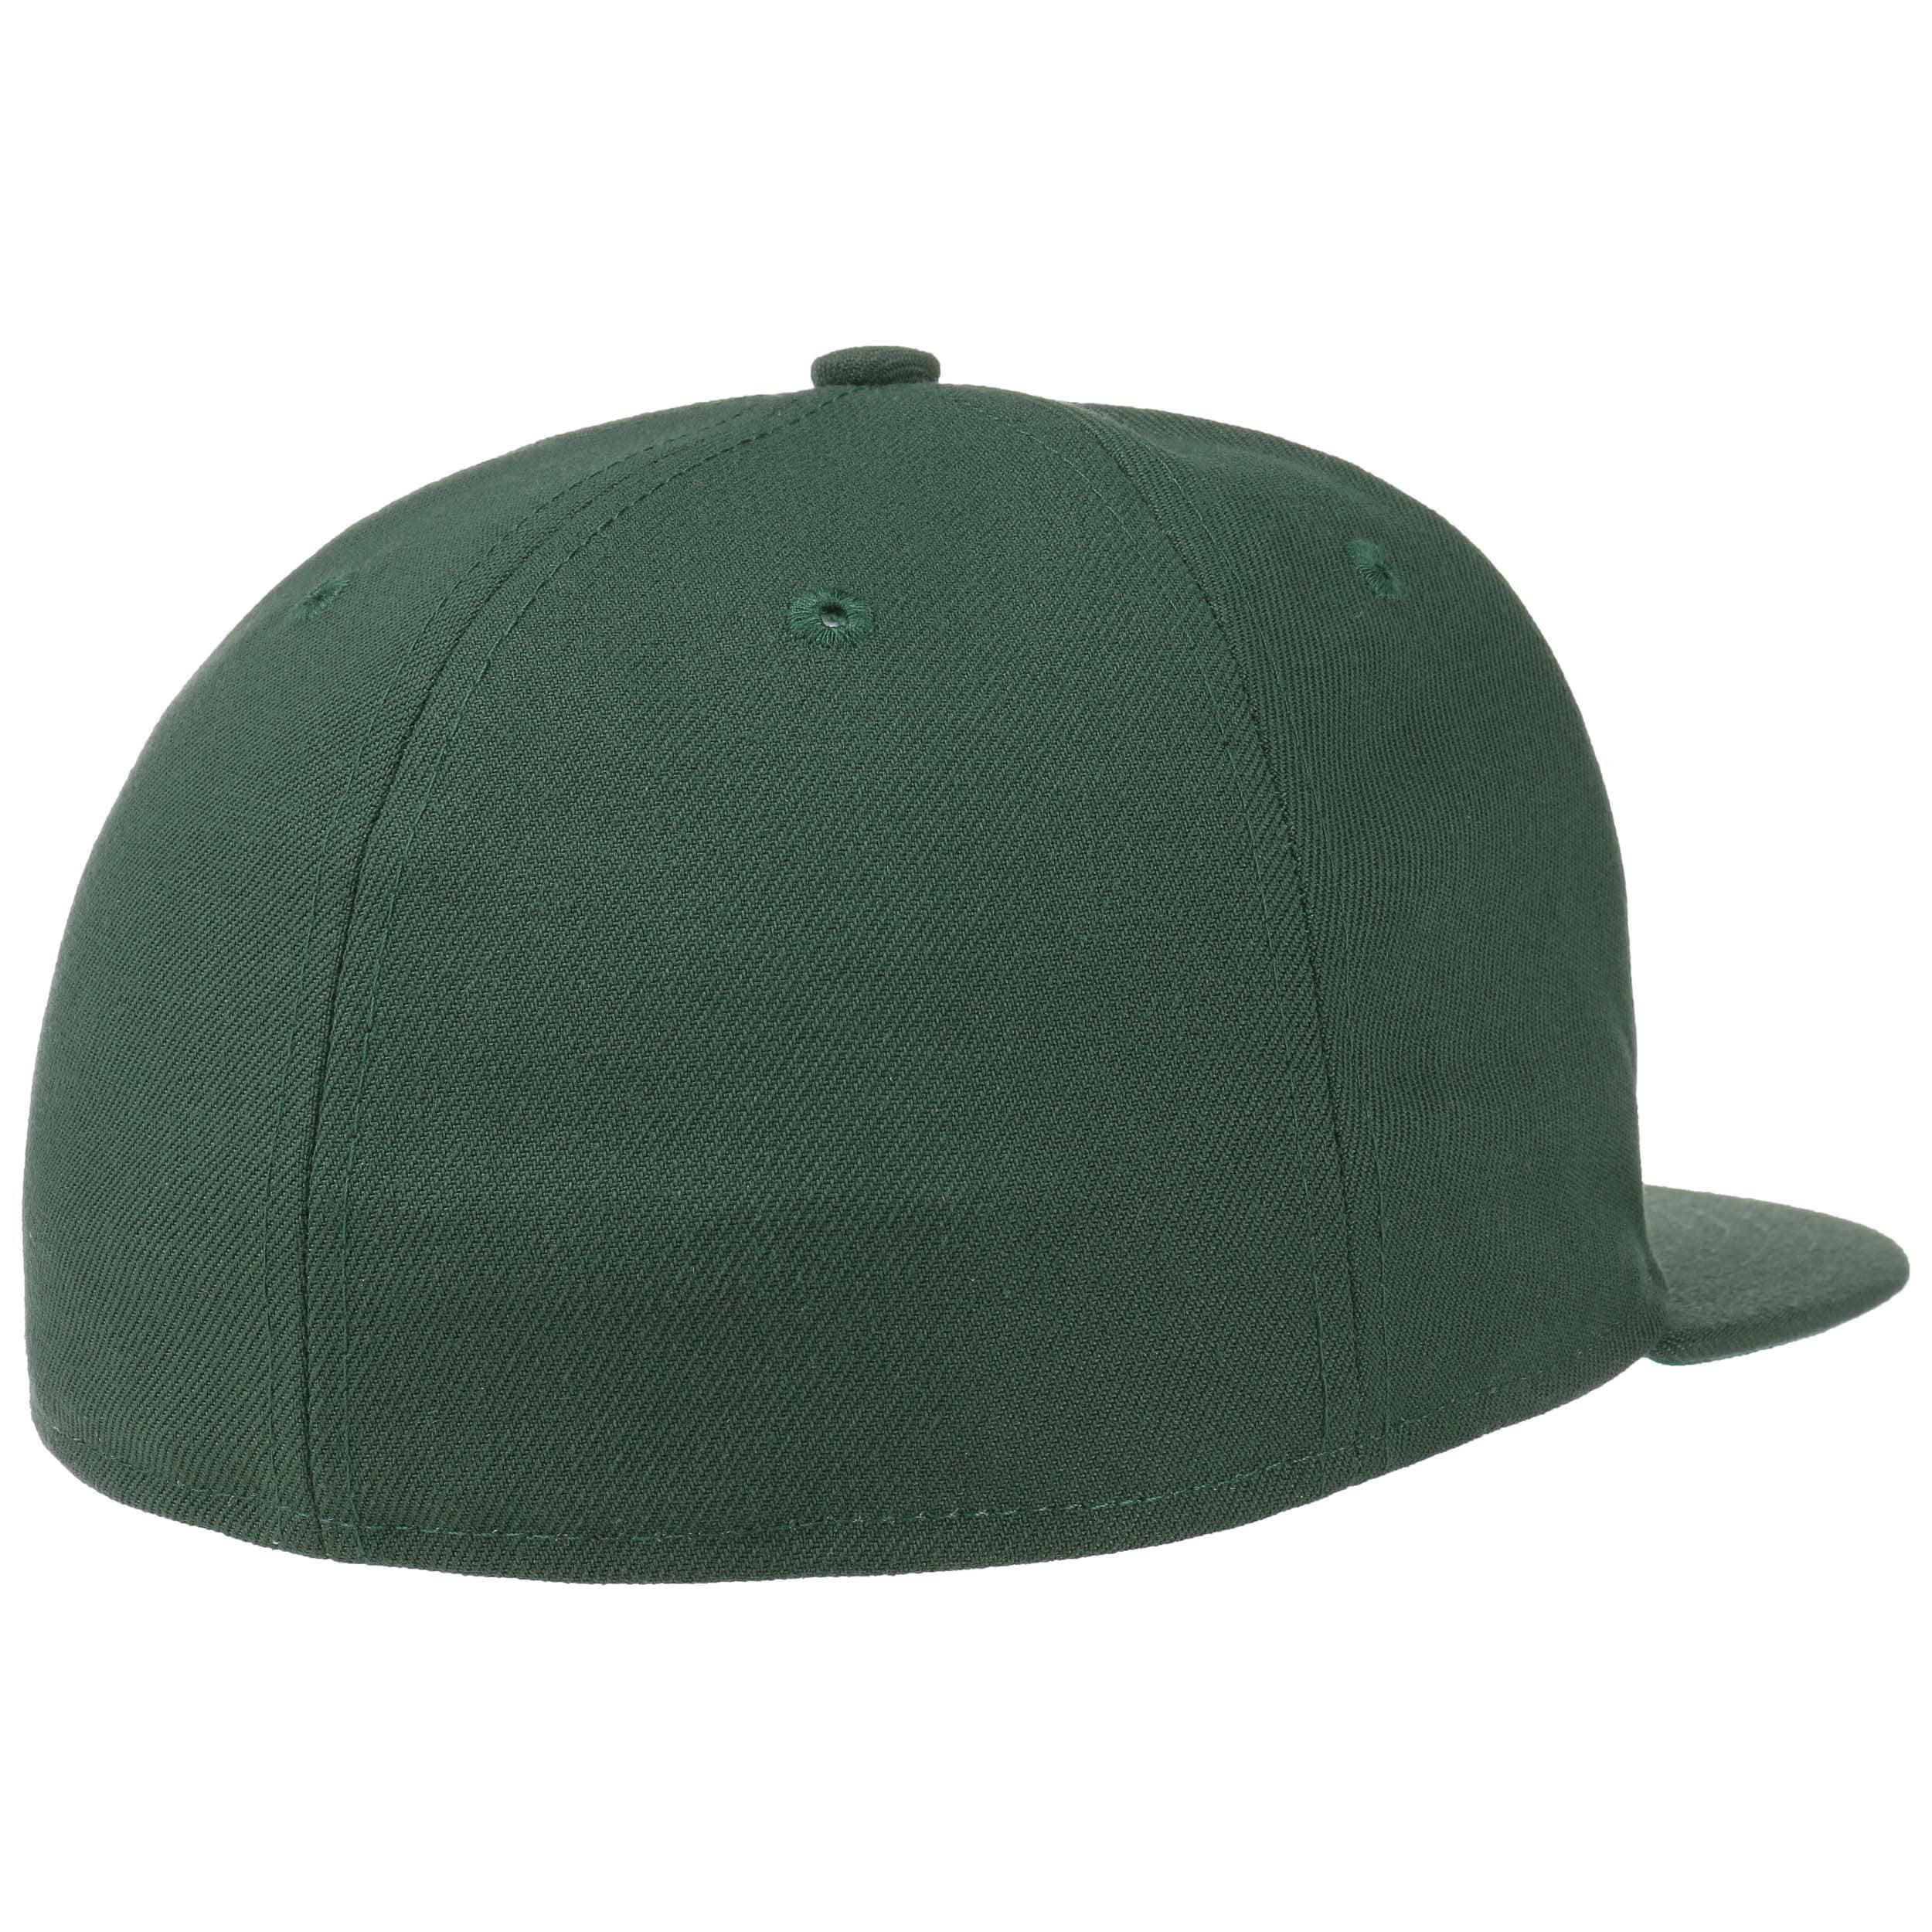 8b3287037eda8 Gorra 59Fifty NFL Classic Packers by New Era - Gorras - sombreroshop.es